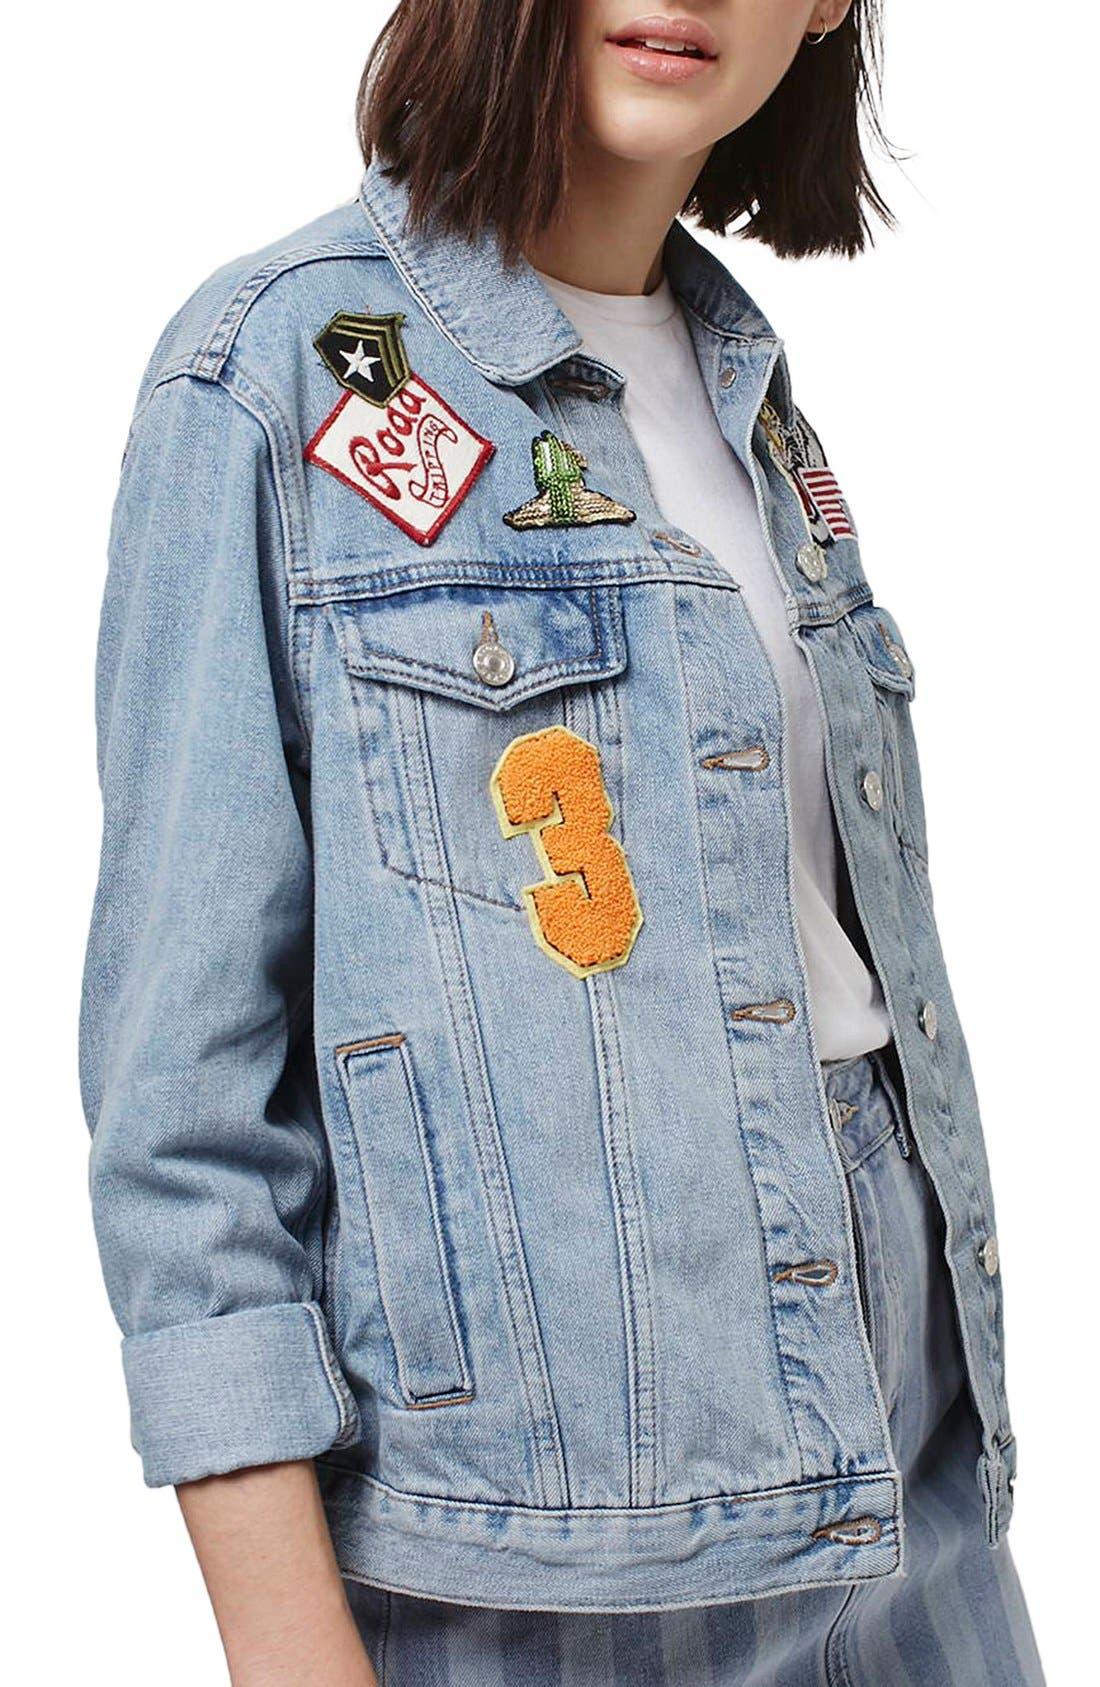 Alternate Image 1 Selected - Topshop Moto Badged Denim Jacket (Petite)